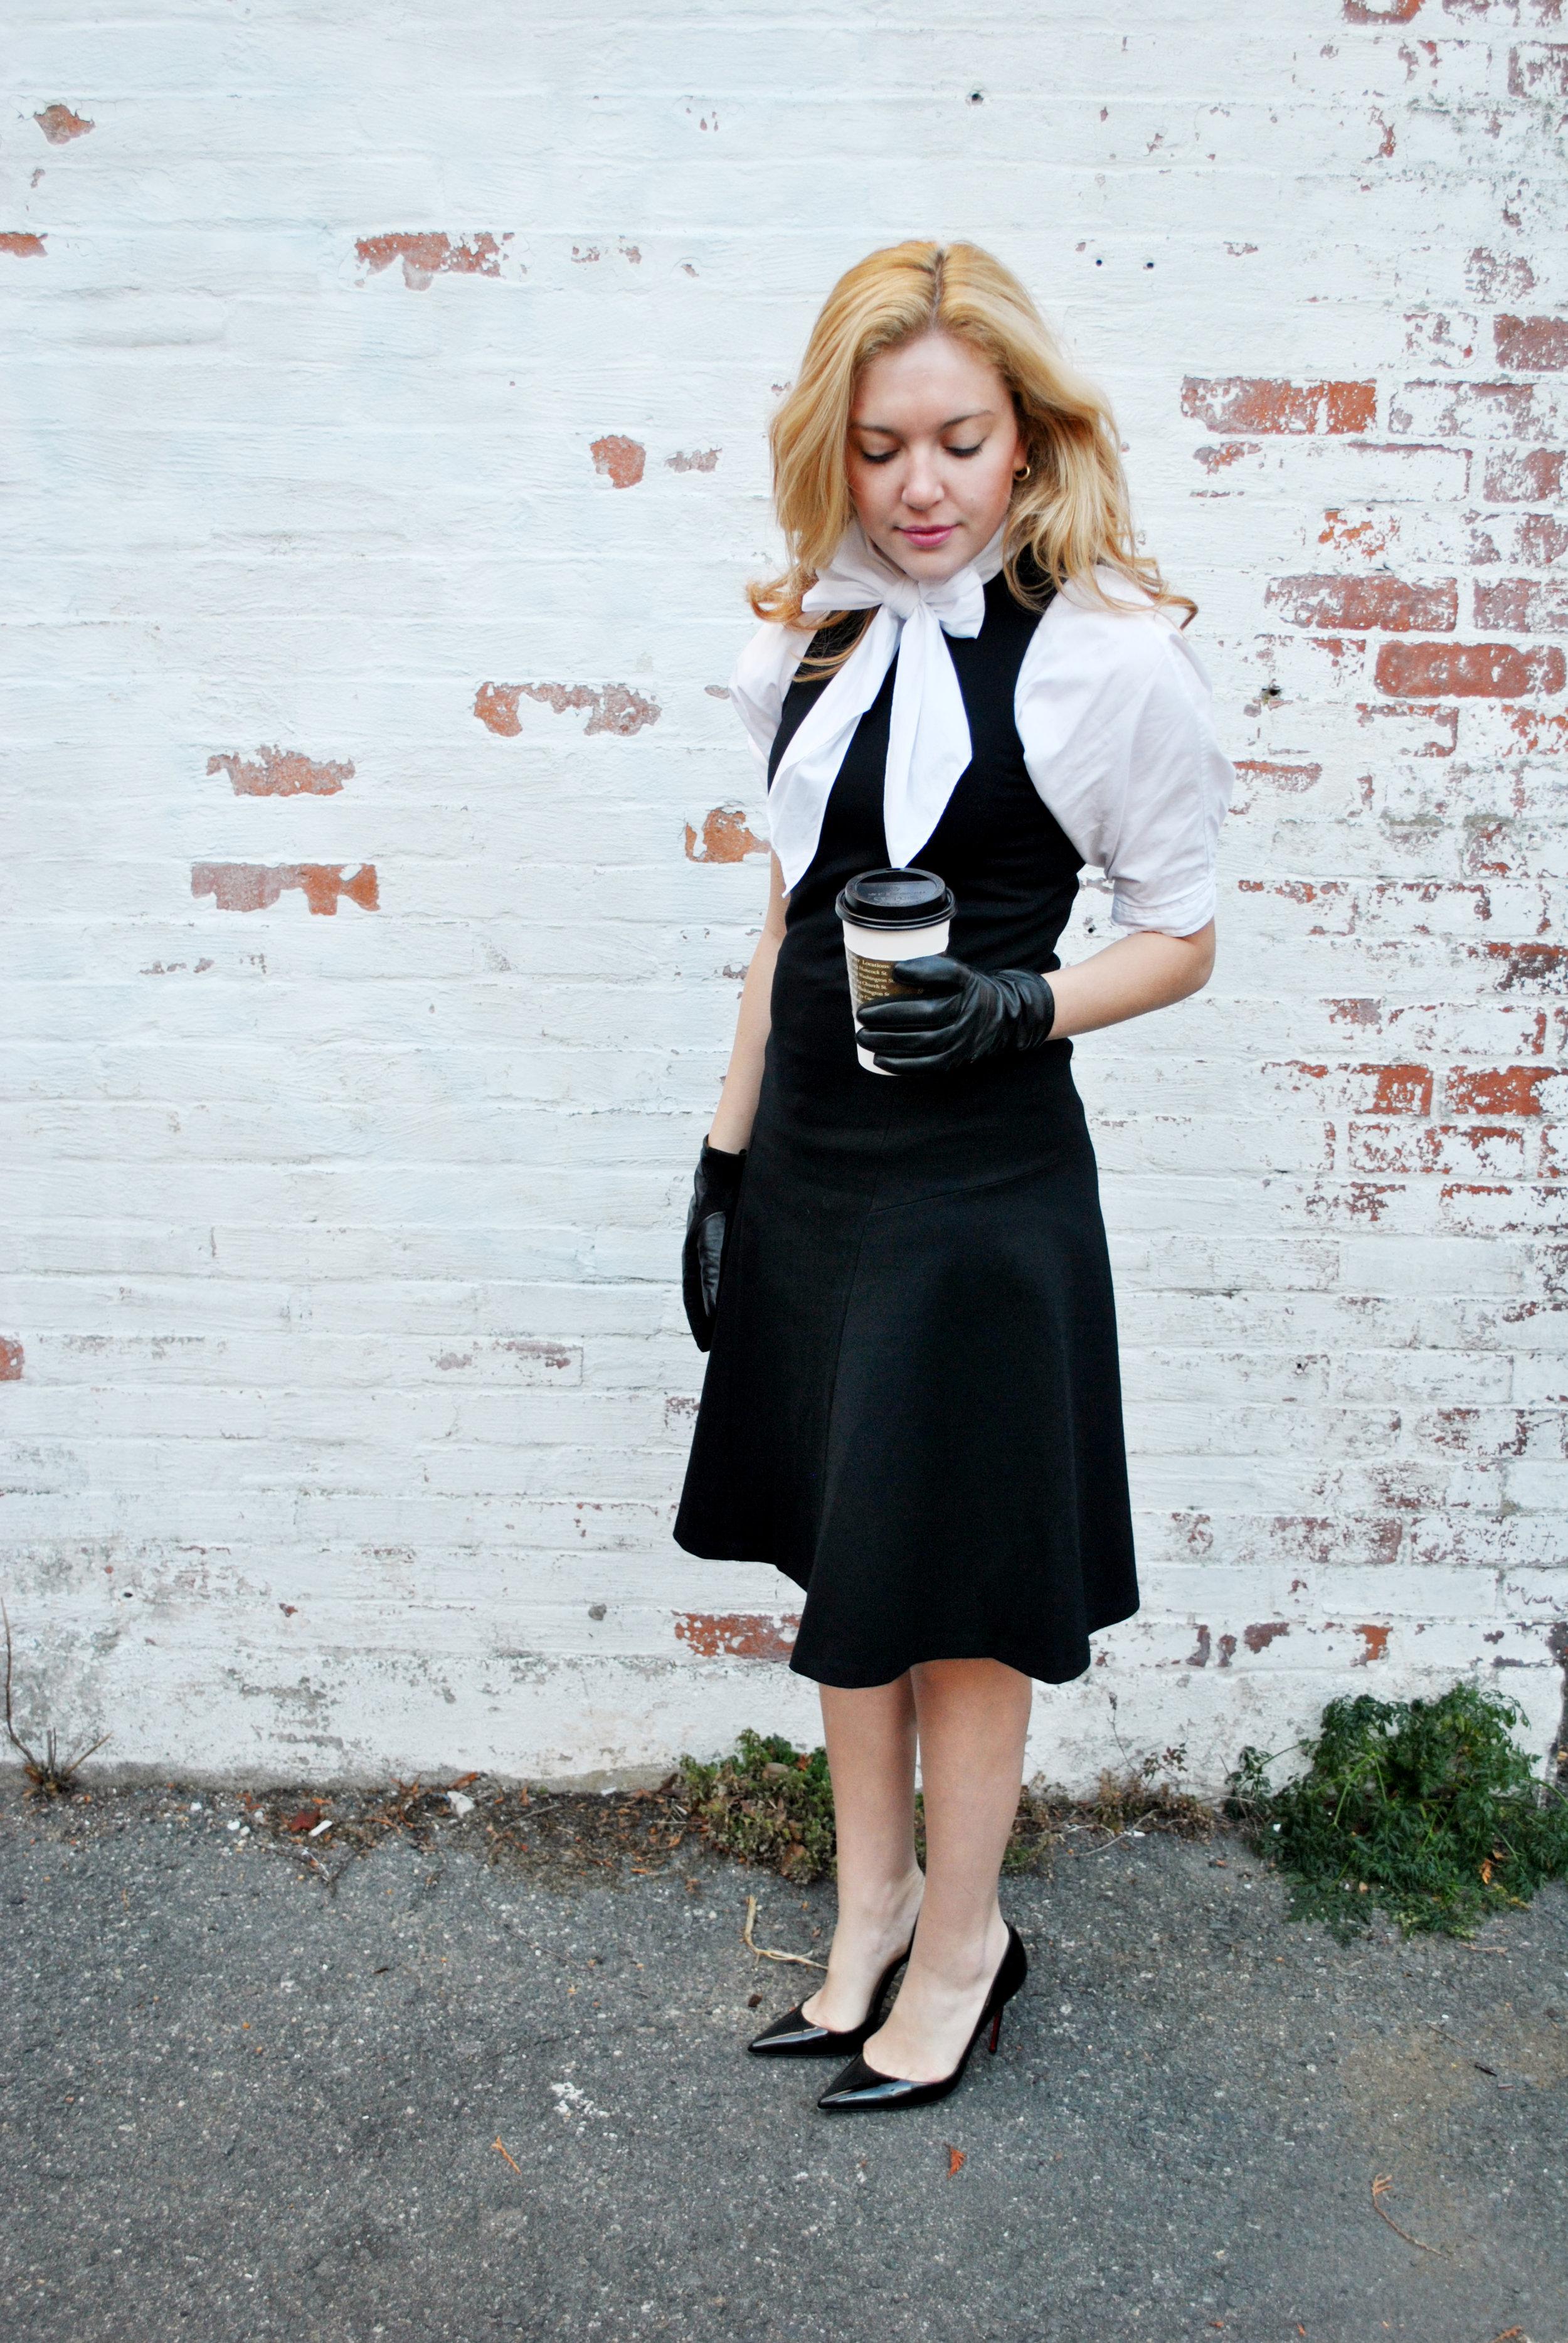 thoughtfulwish | friends, ralph lauren, black and white, winter fashion, rachel green